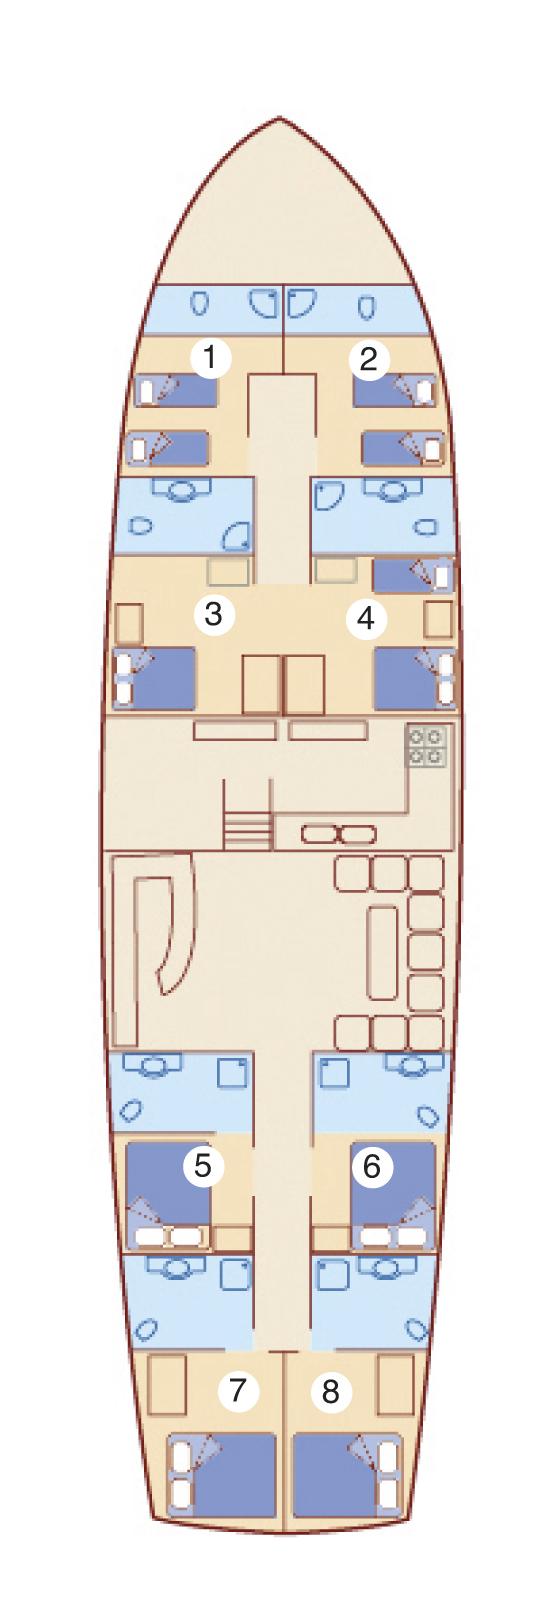 Sunworld-VIII-layout.jpg